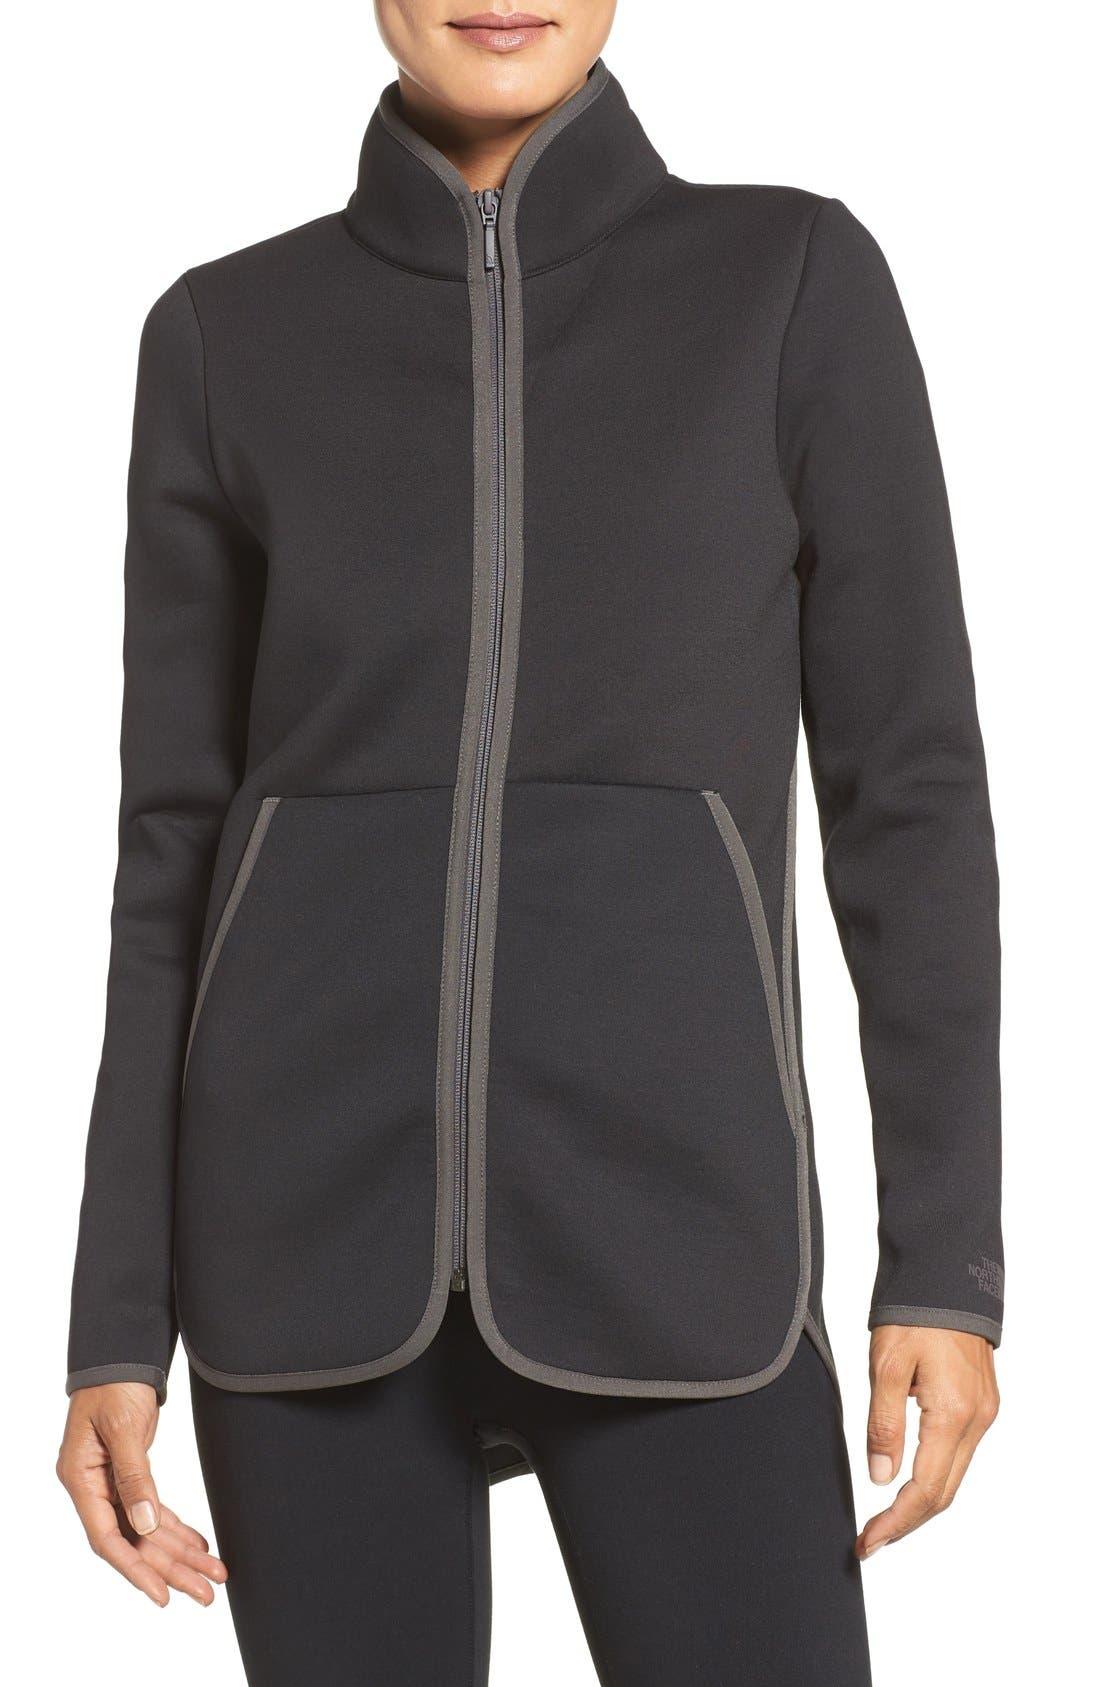 Main Image - The North Face Neo Knit Jacket